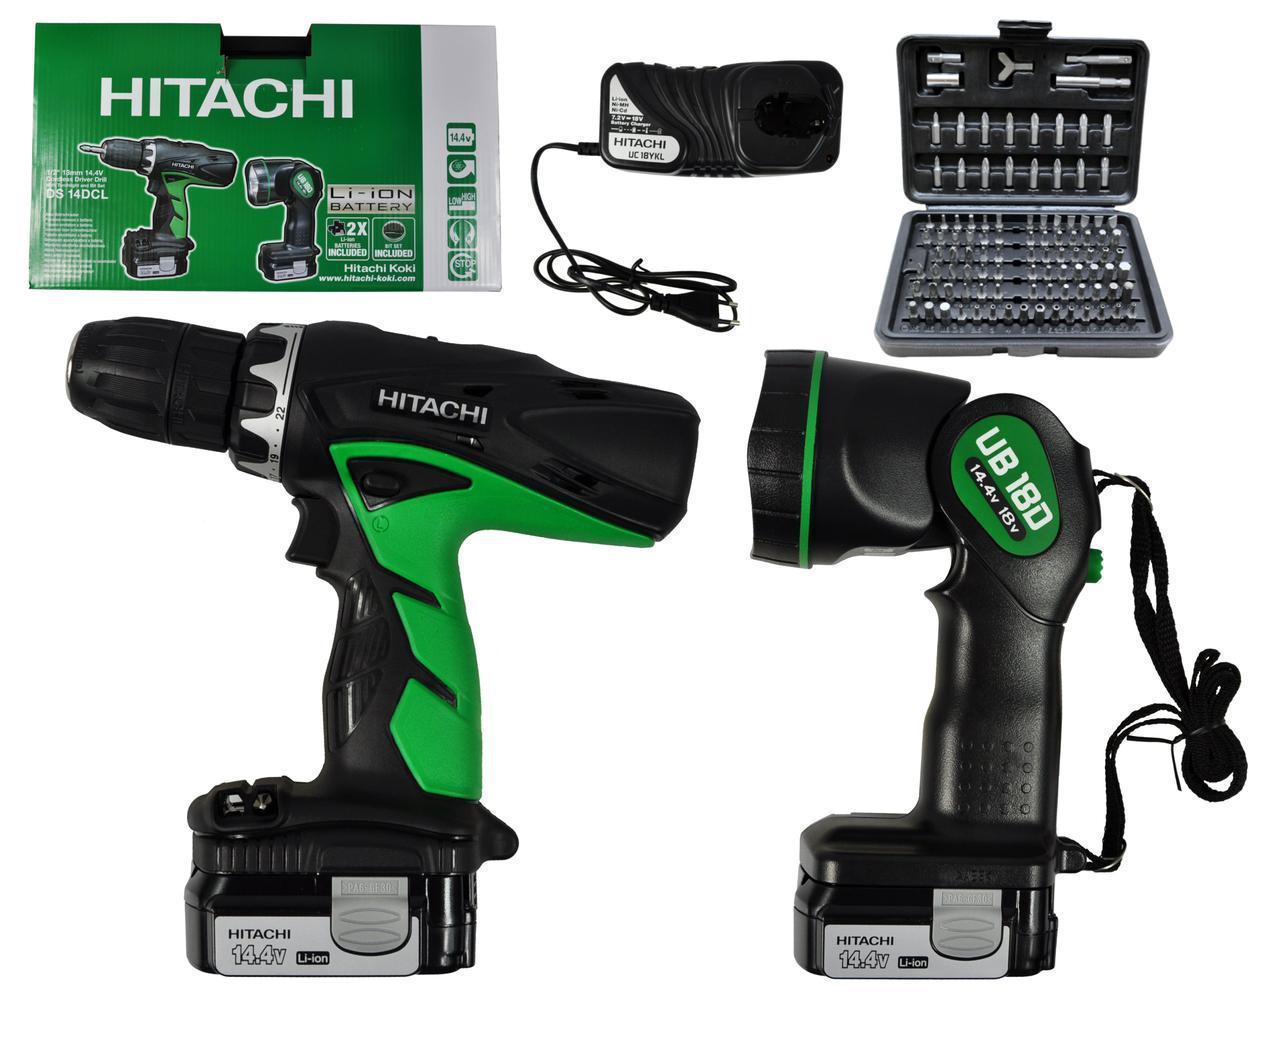 Дрель-шуруповерт HITACHI DS14DCL + фонарь + набор бит 100 шт, фото 1